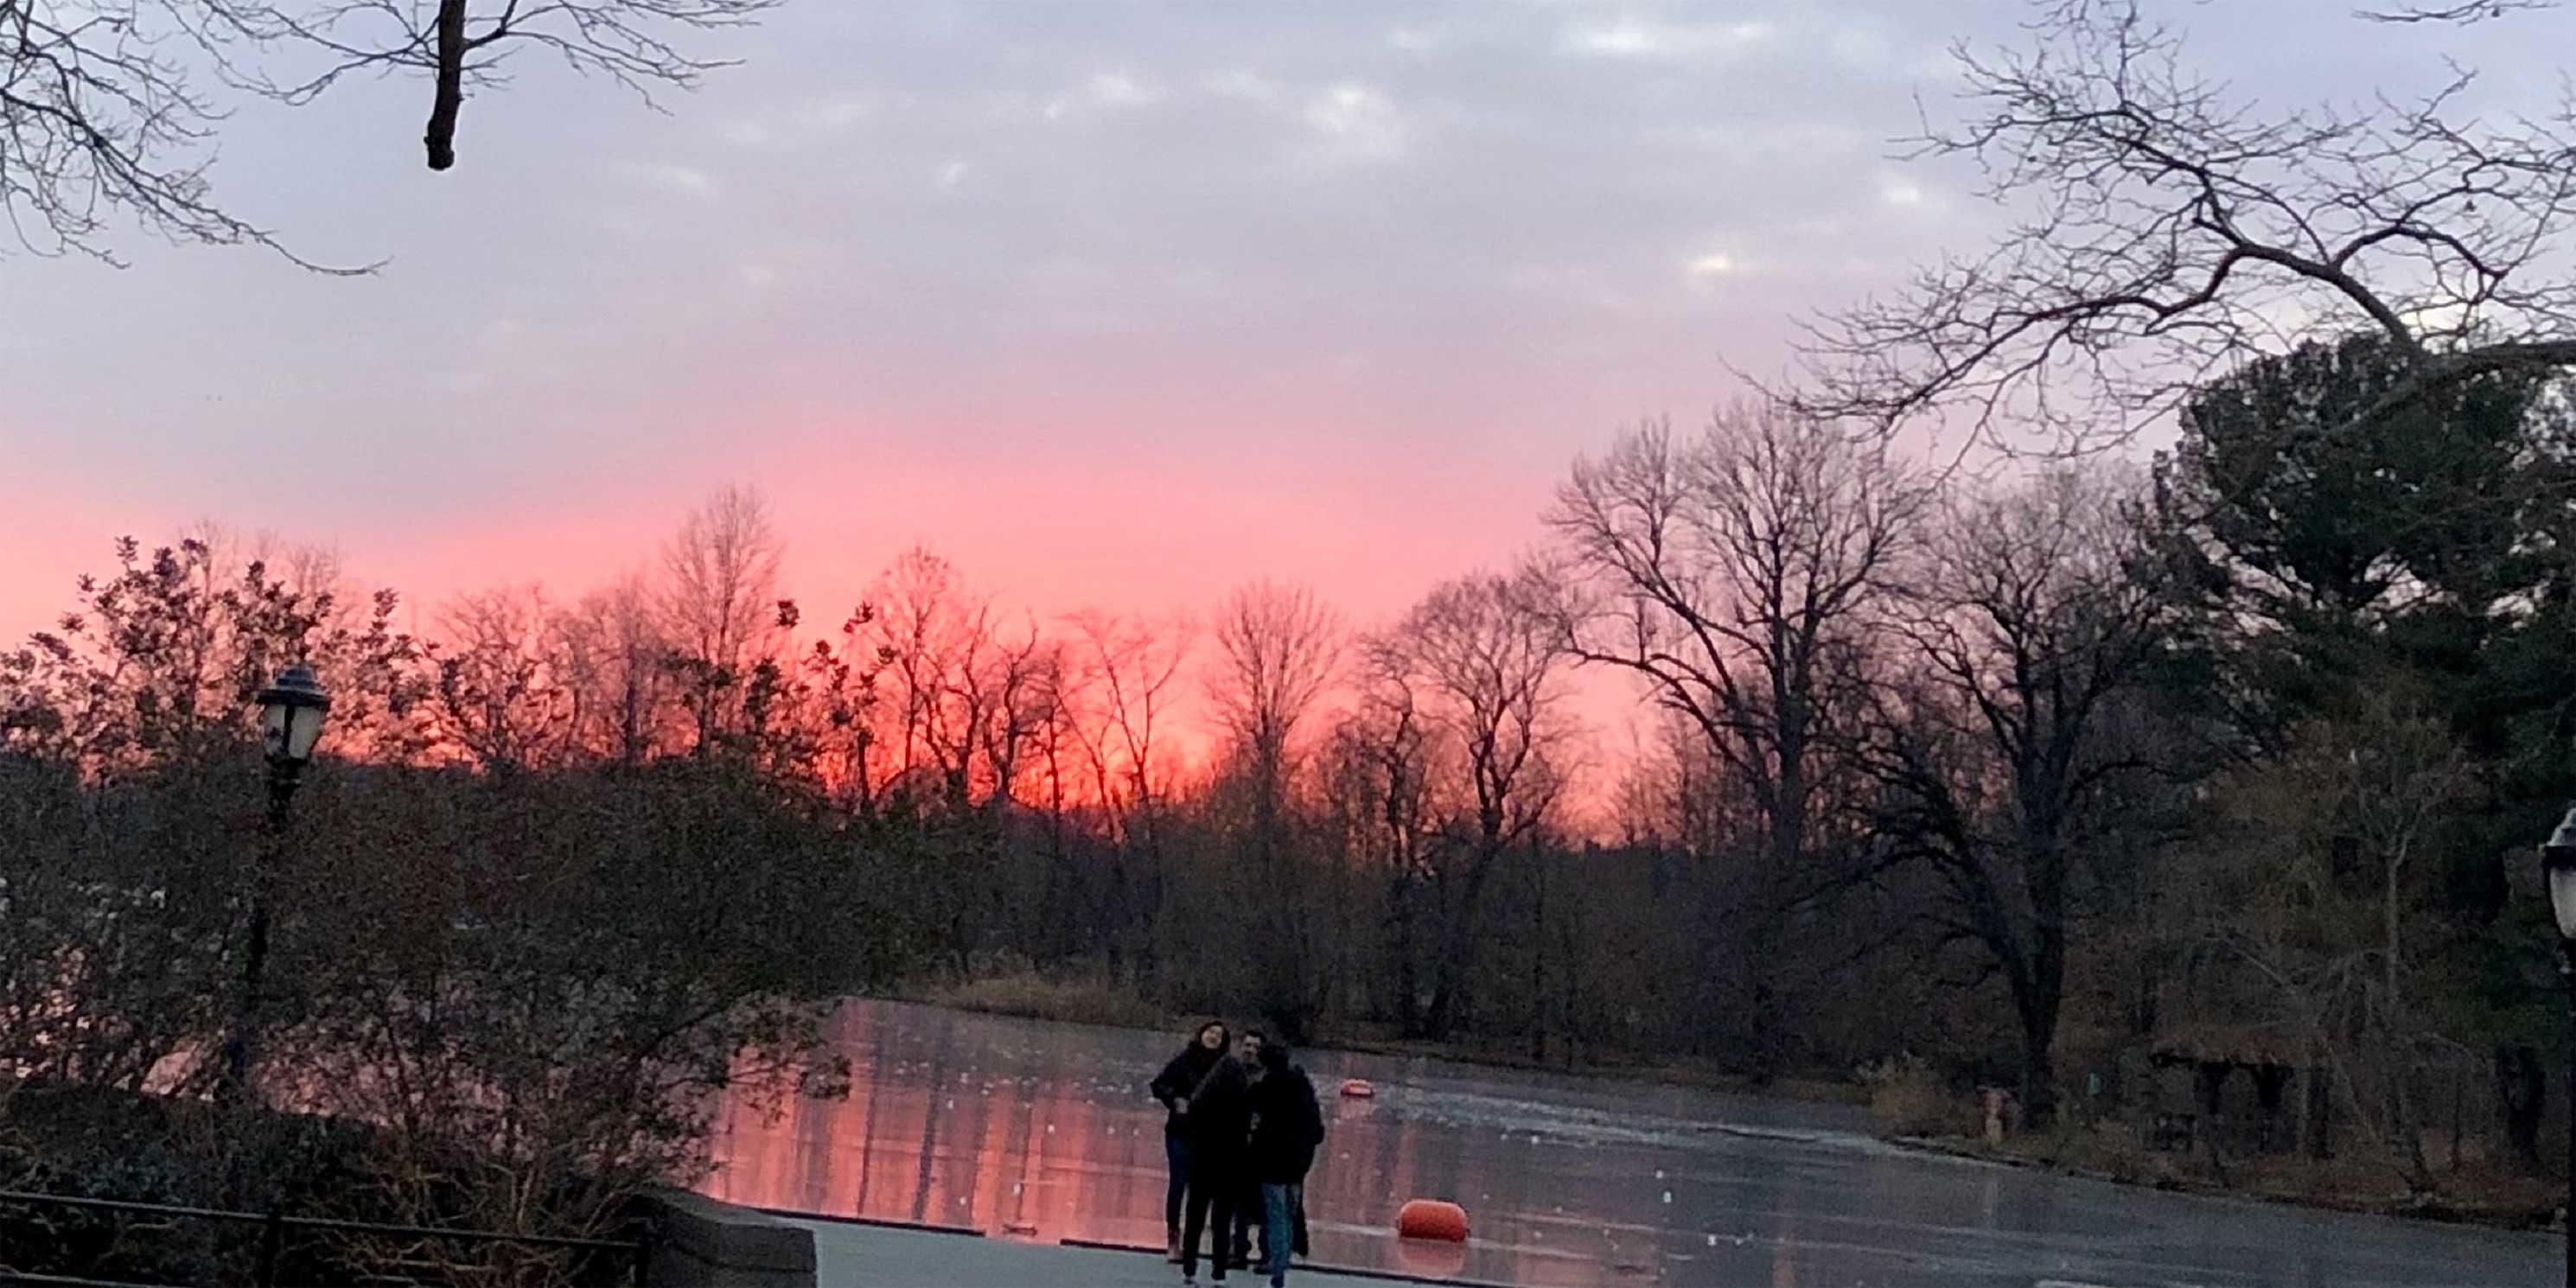 people enjoy a winter sunset in Prospect Park